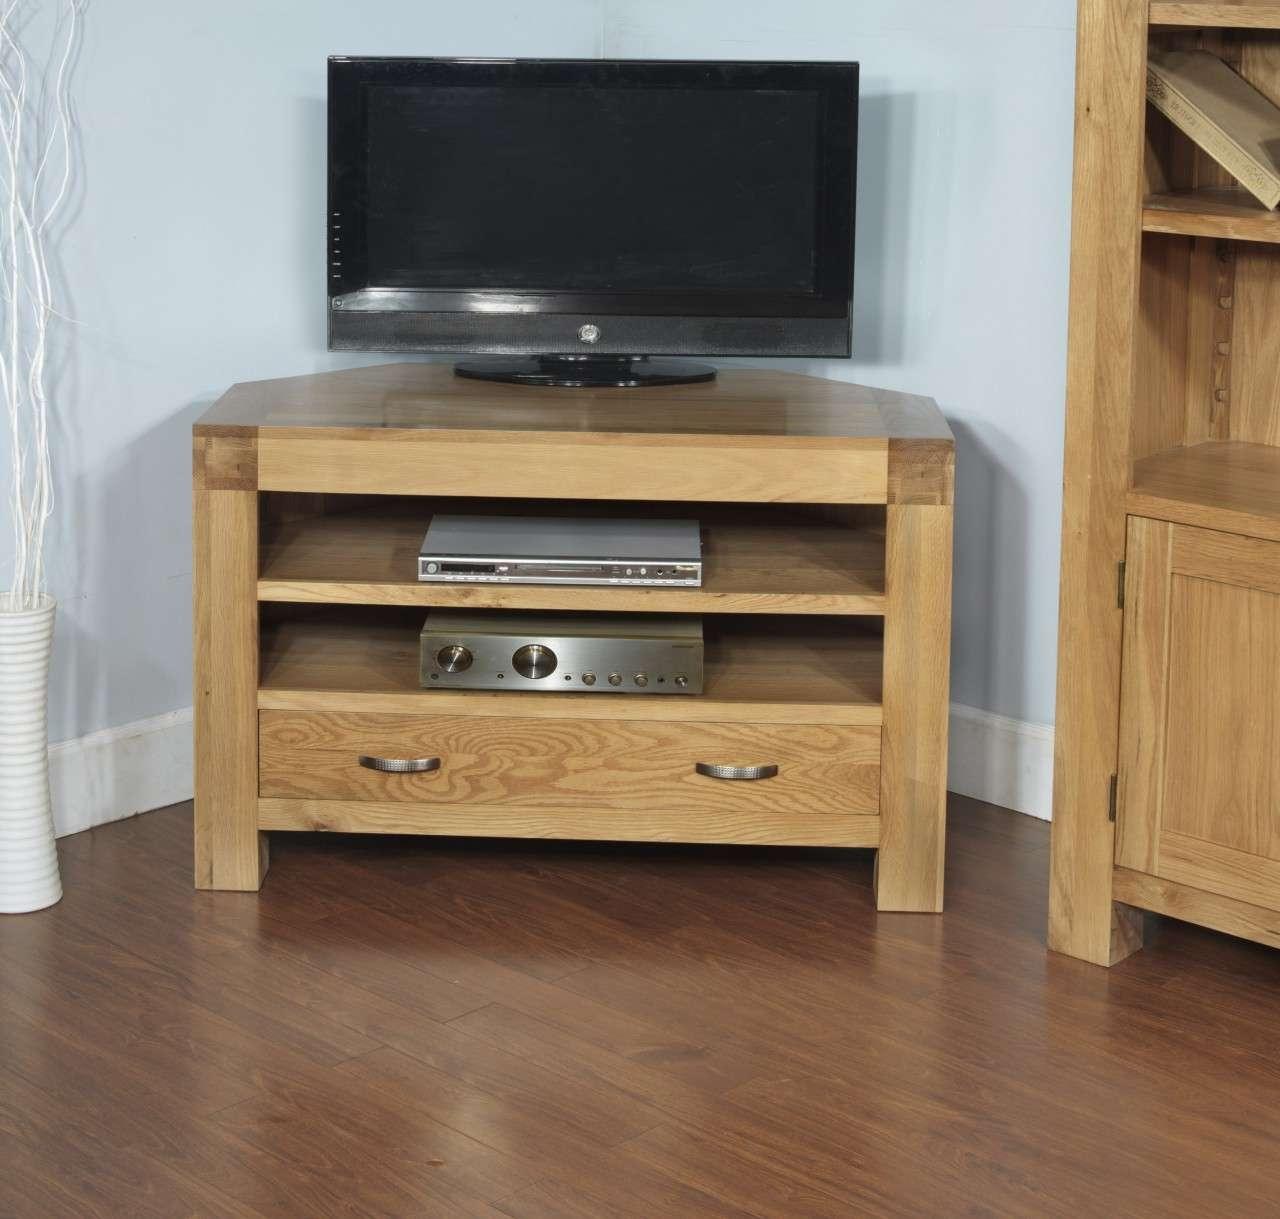 Rivermead Solid Oak Modern Furniture Widescreen Corner Tv Cabinet Regarding Real Wood Corner Tv Stands (View 7 of 15)